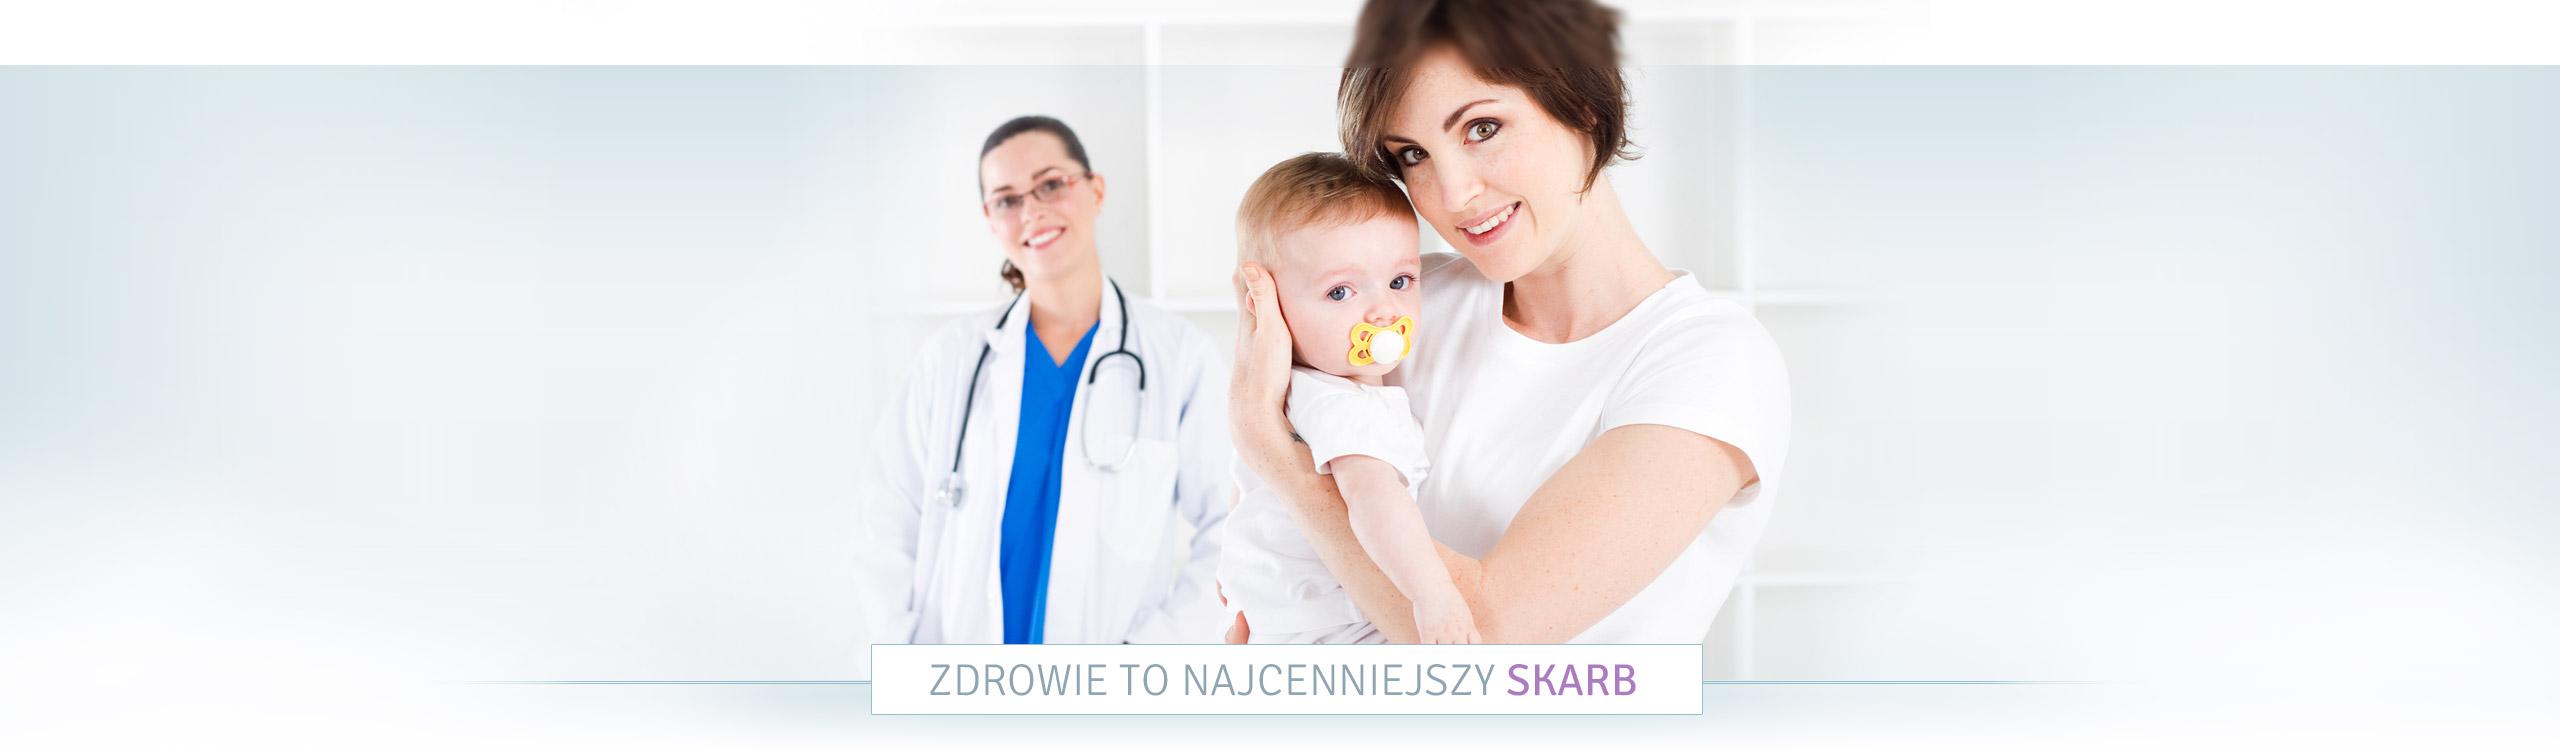 Alfamedica Kraków